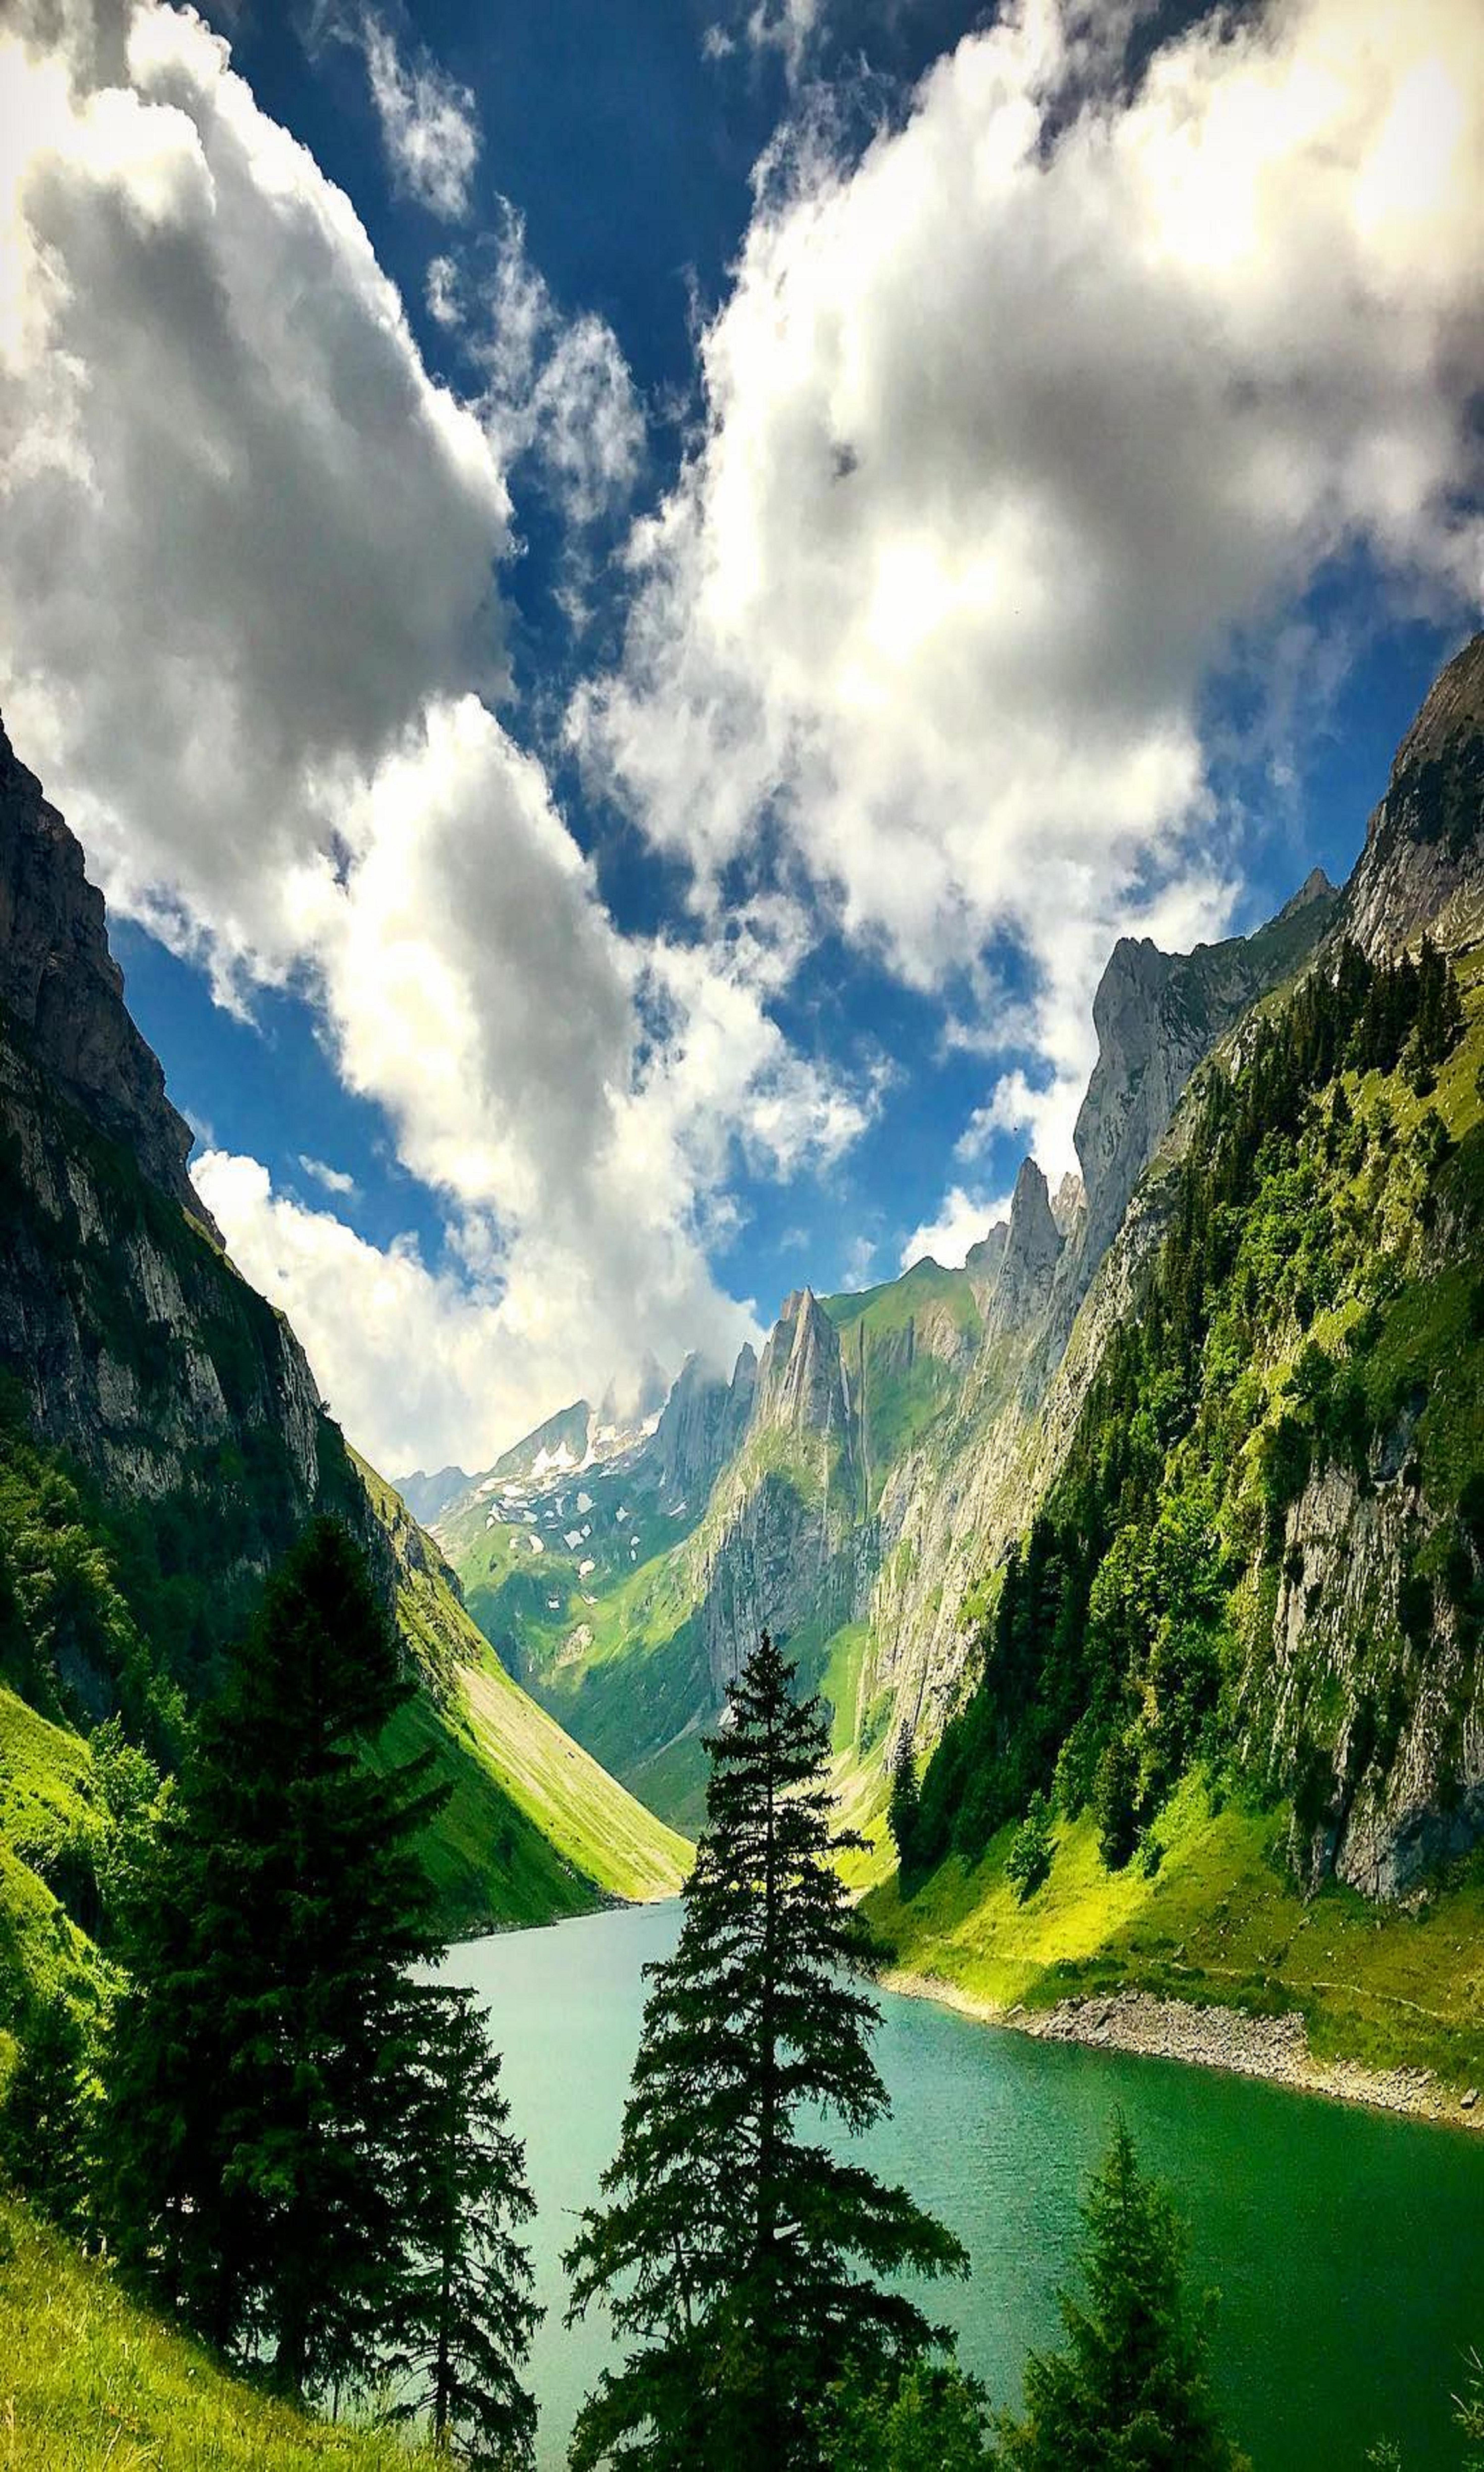 Glorious Mountains Nature Photography Beautiful Nature Rural Photography